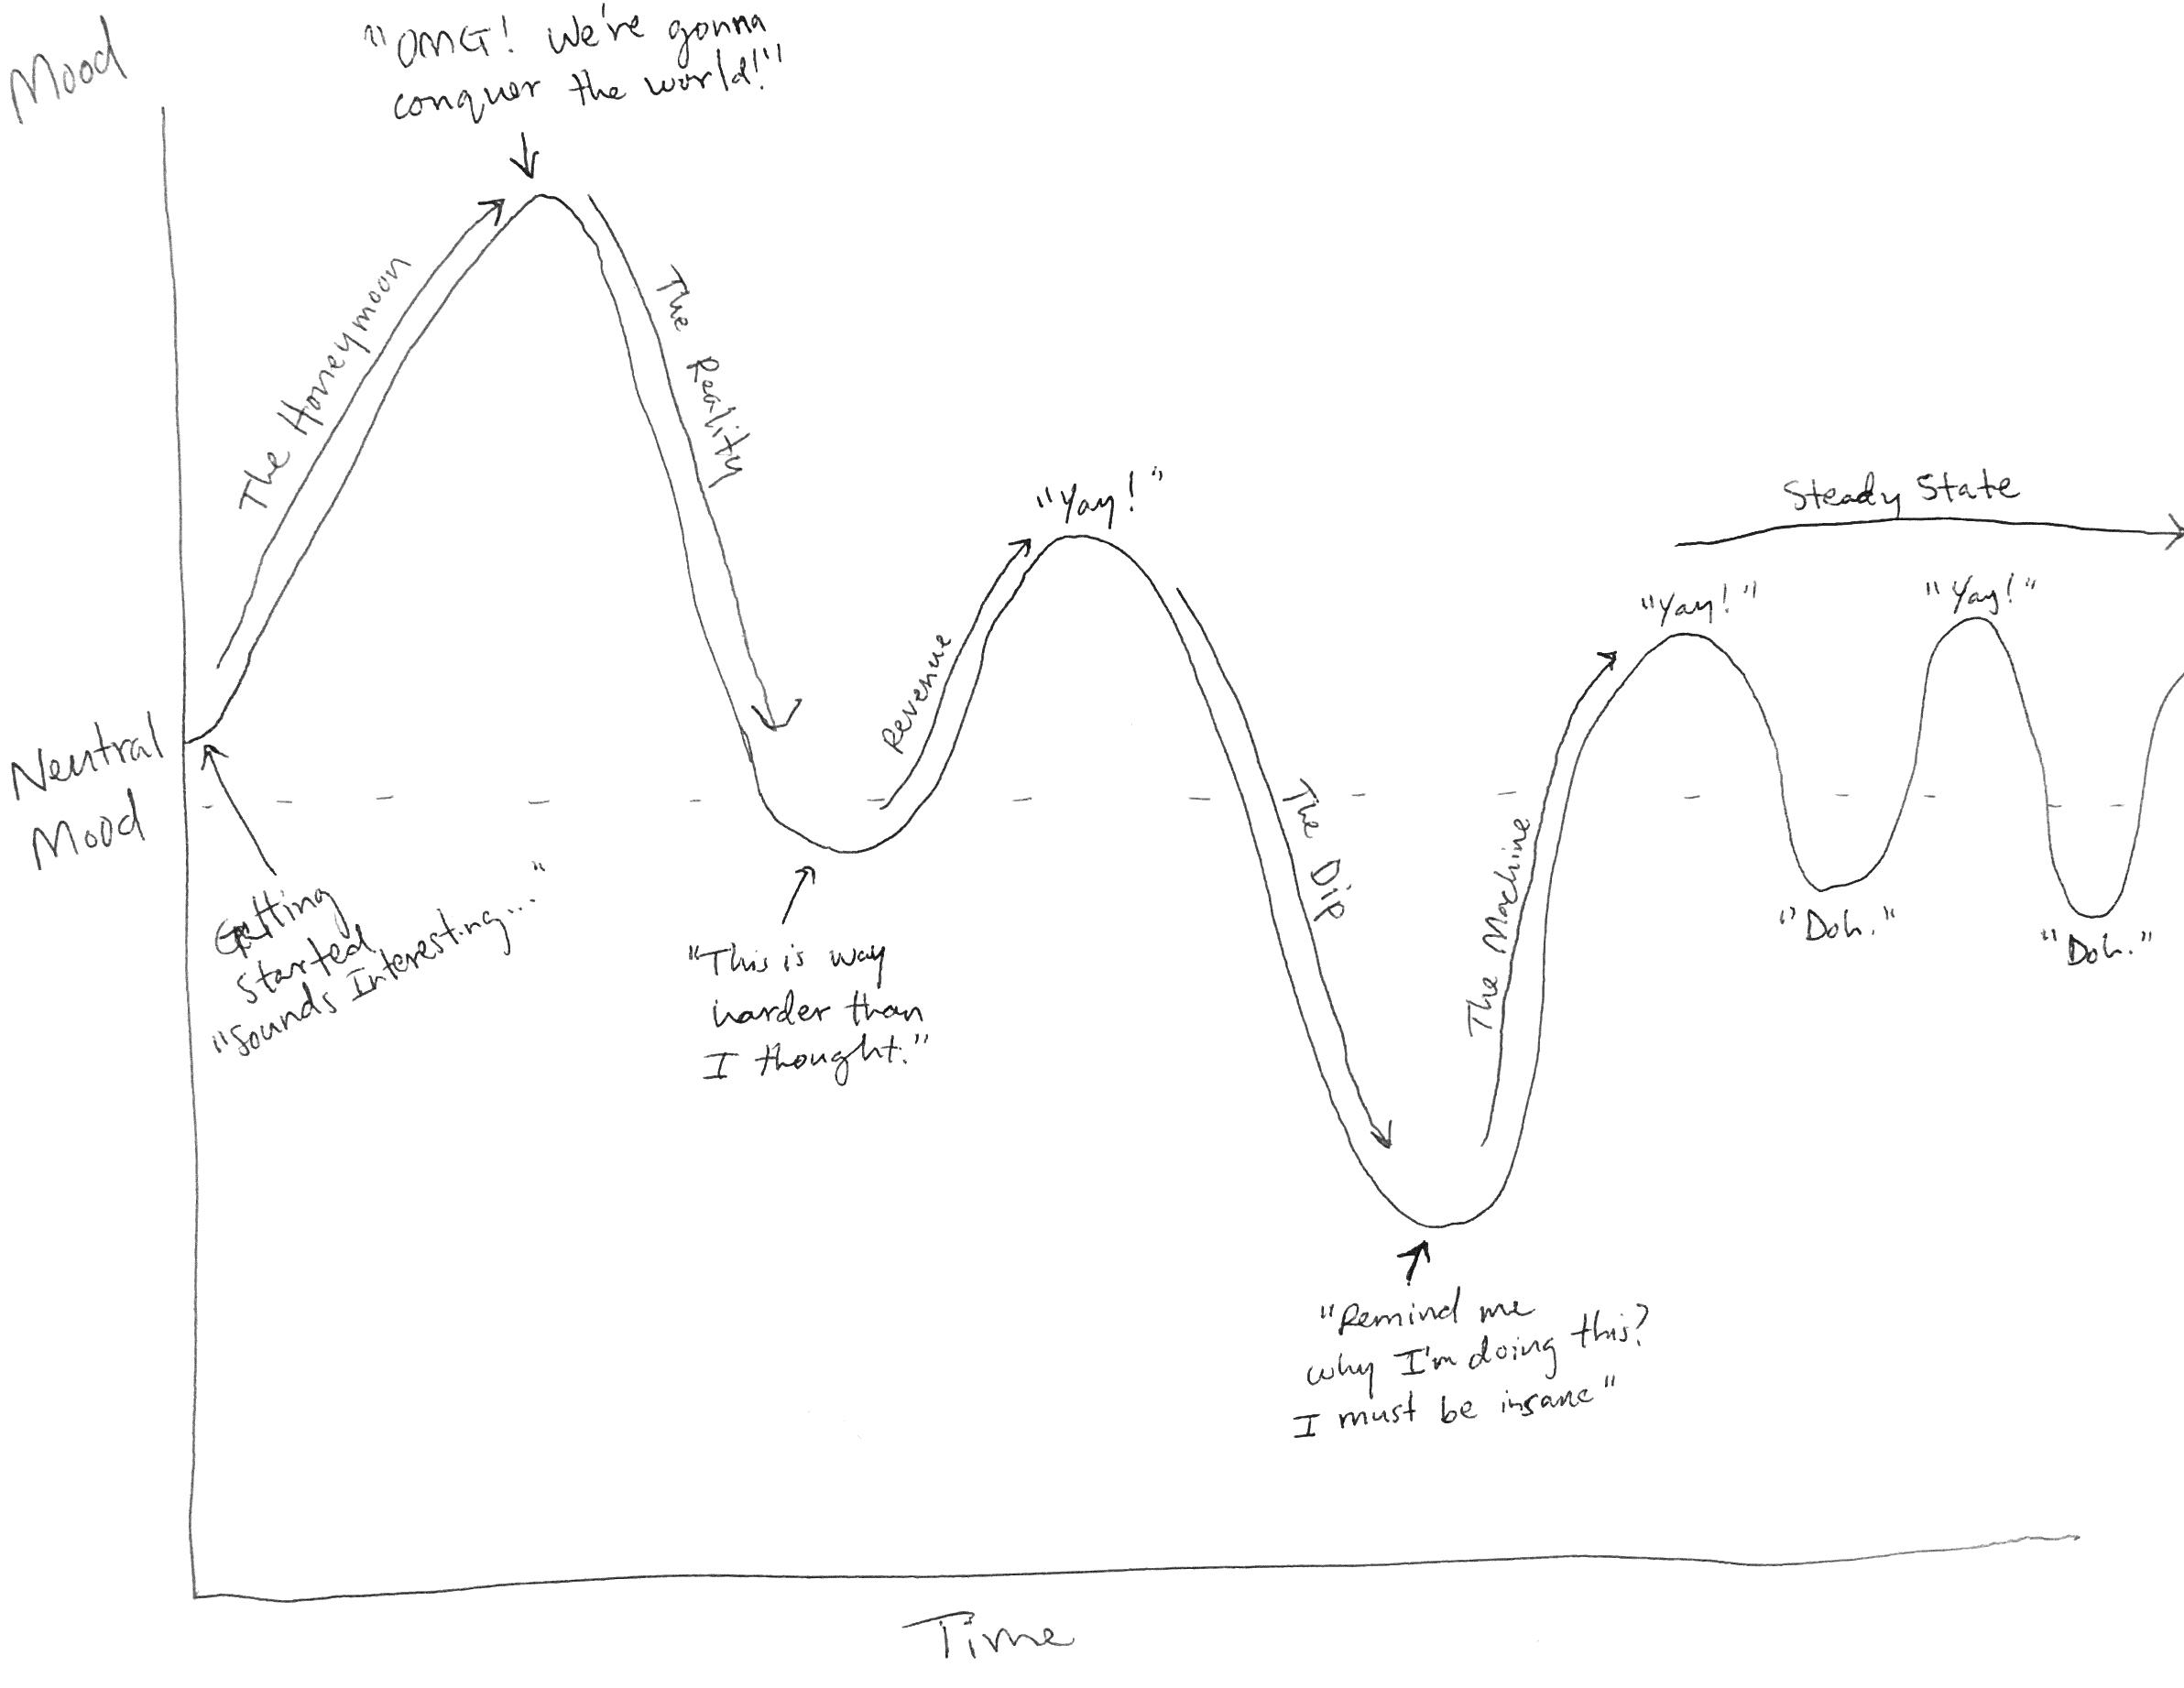 The-Entrepreneur-s-Rollercoaster-1.jpg